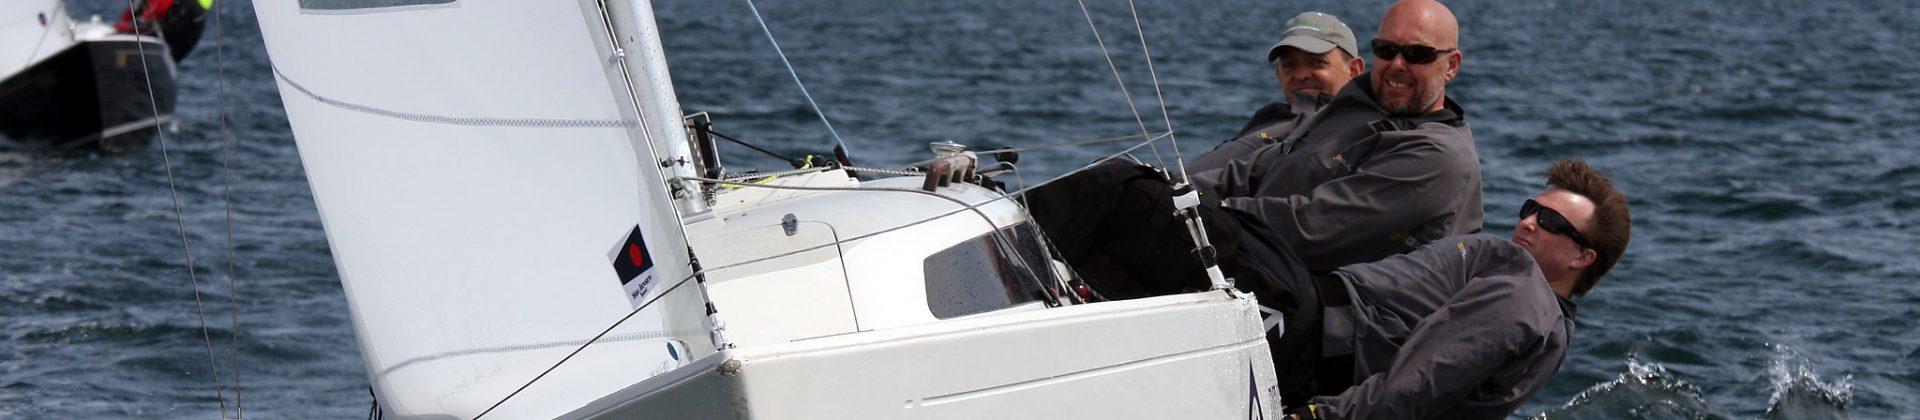 Danske H-bådssejlere